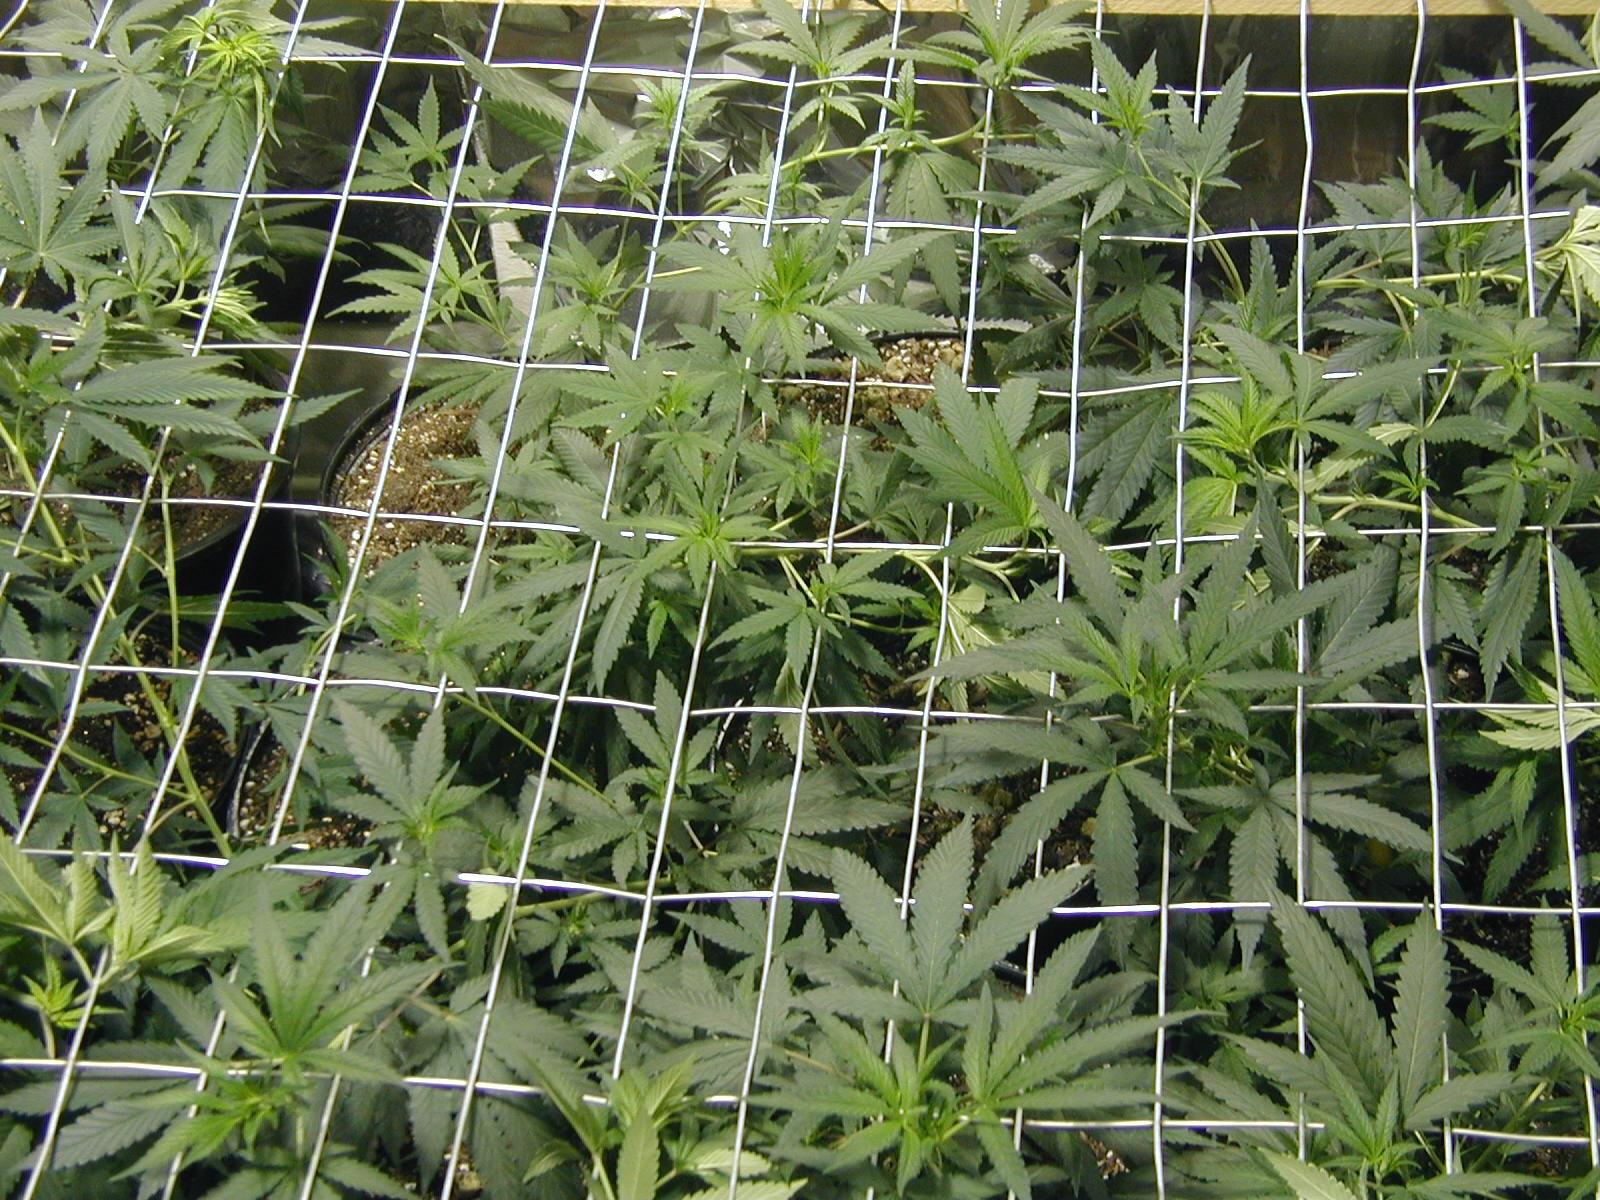 Growing Great Marijuana by Logan Edwards (2006, Softcover)